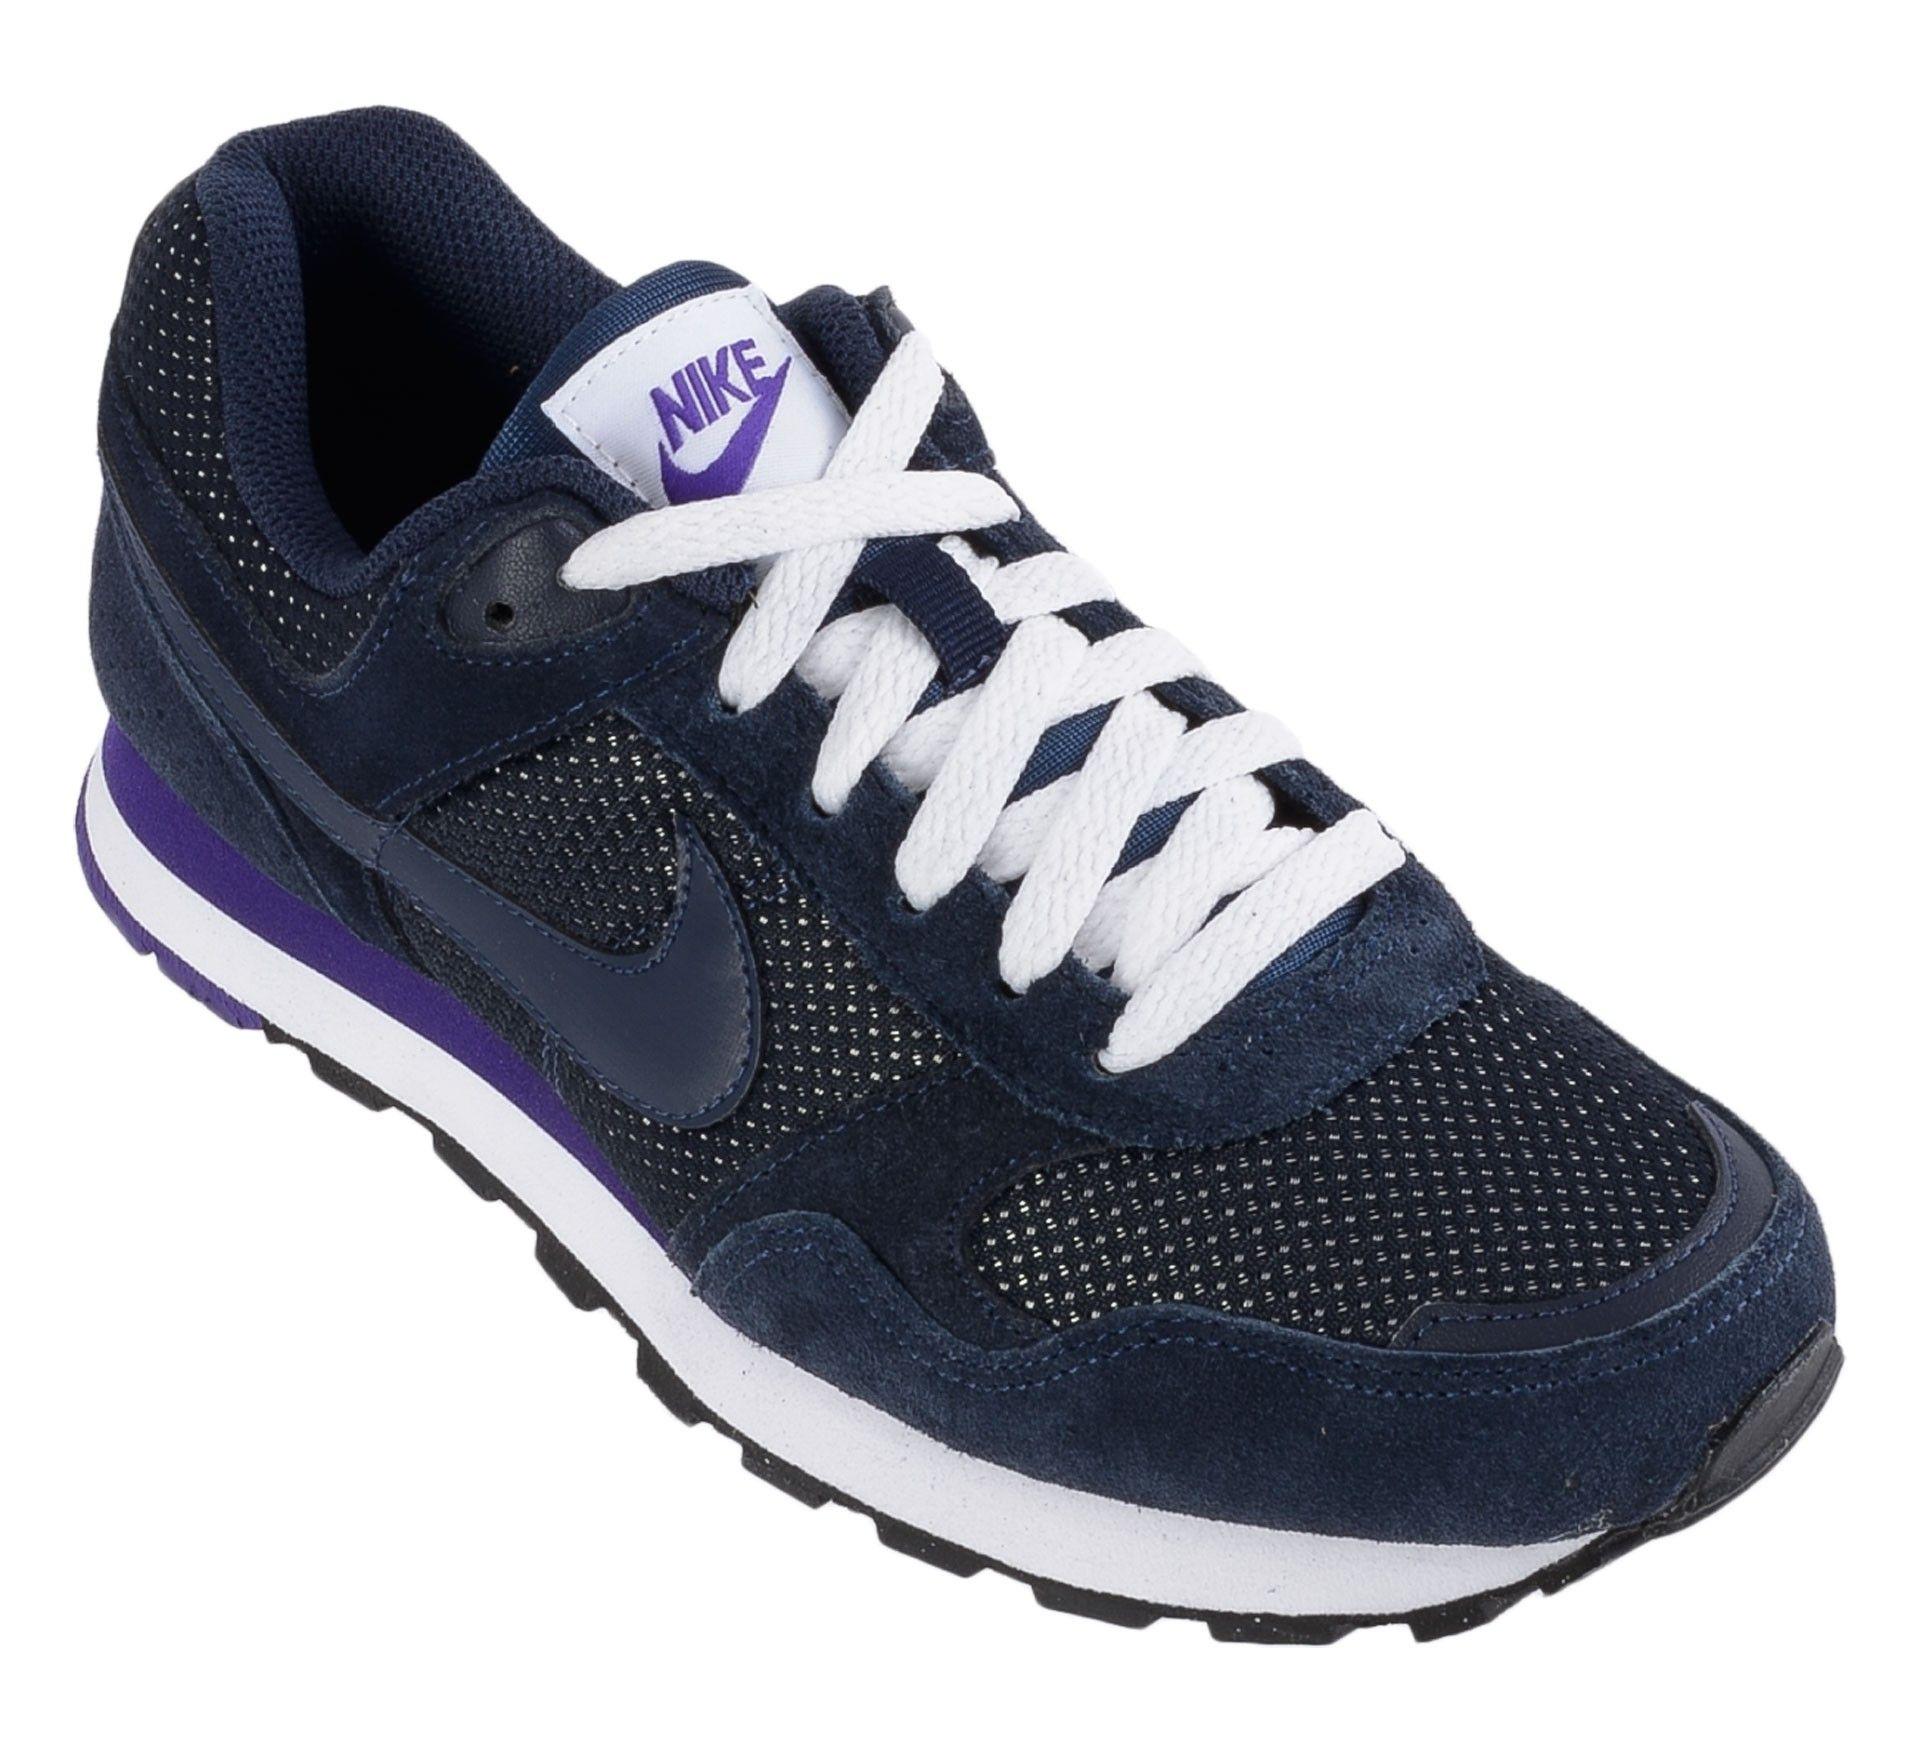 Nike MD Runner Sneakers Dames | Loopschoenen nike, Nike ...